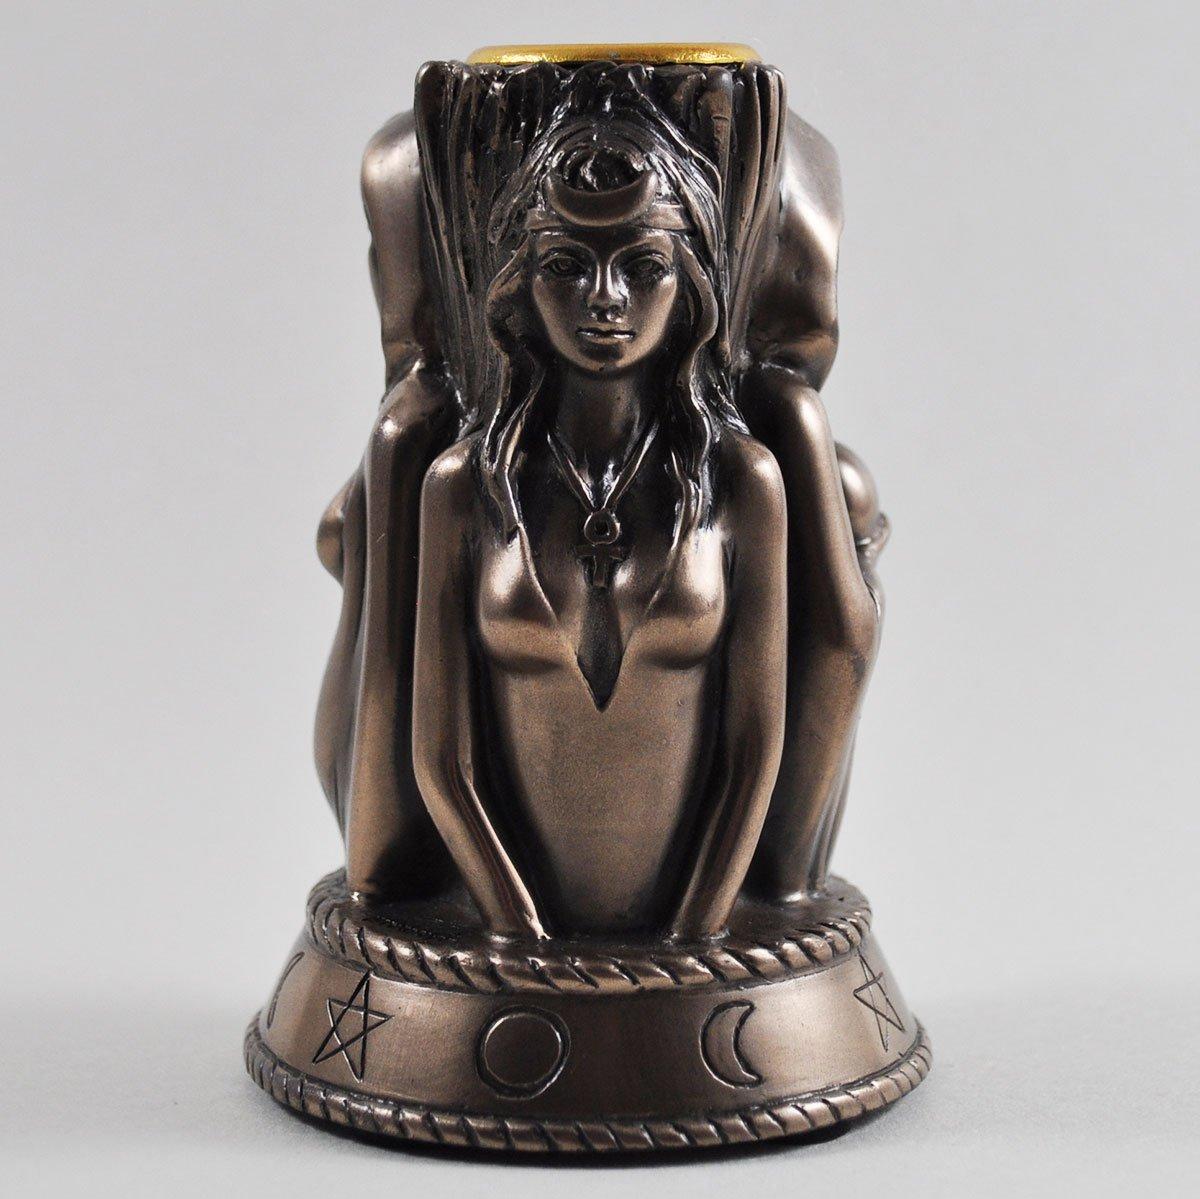 3 Witches Candle Stick Bronze Ornament. H10cm Tina Tarrant Fiesta Studios